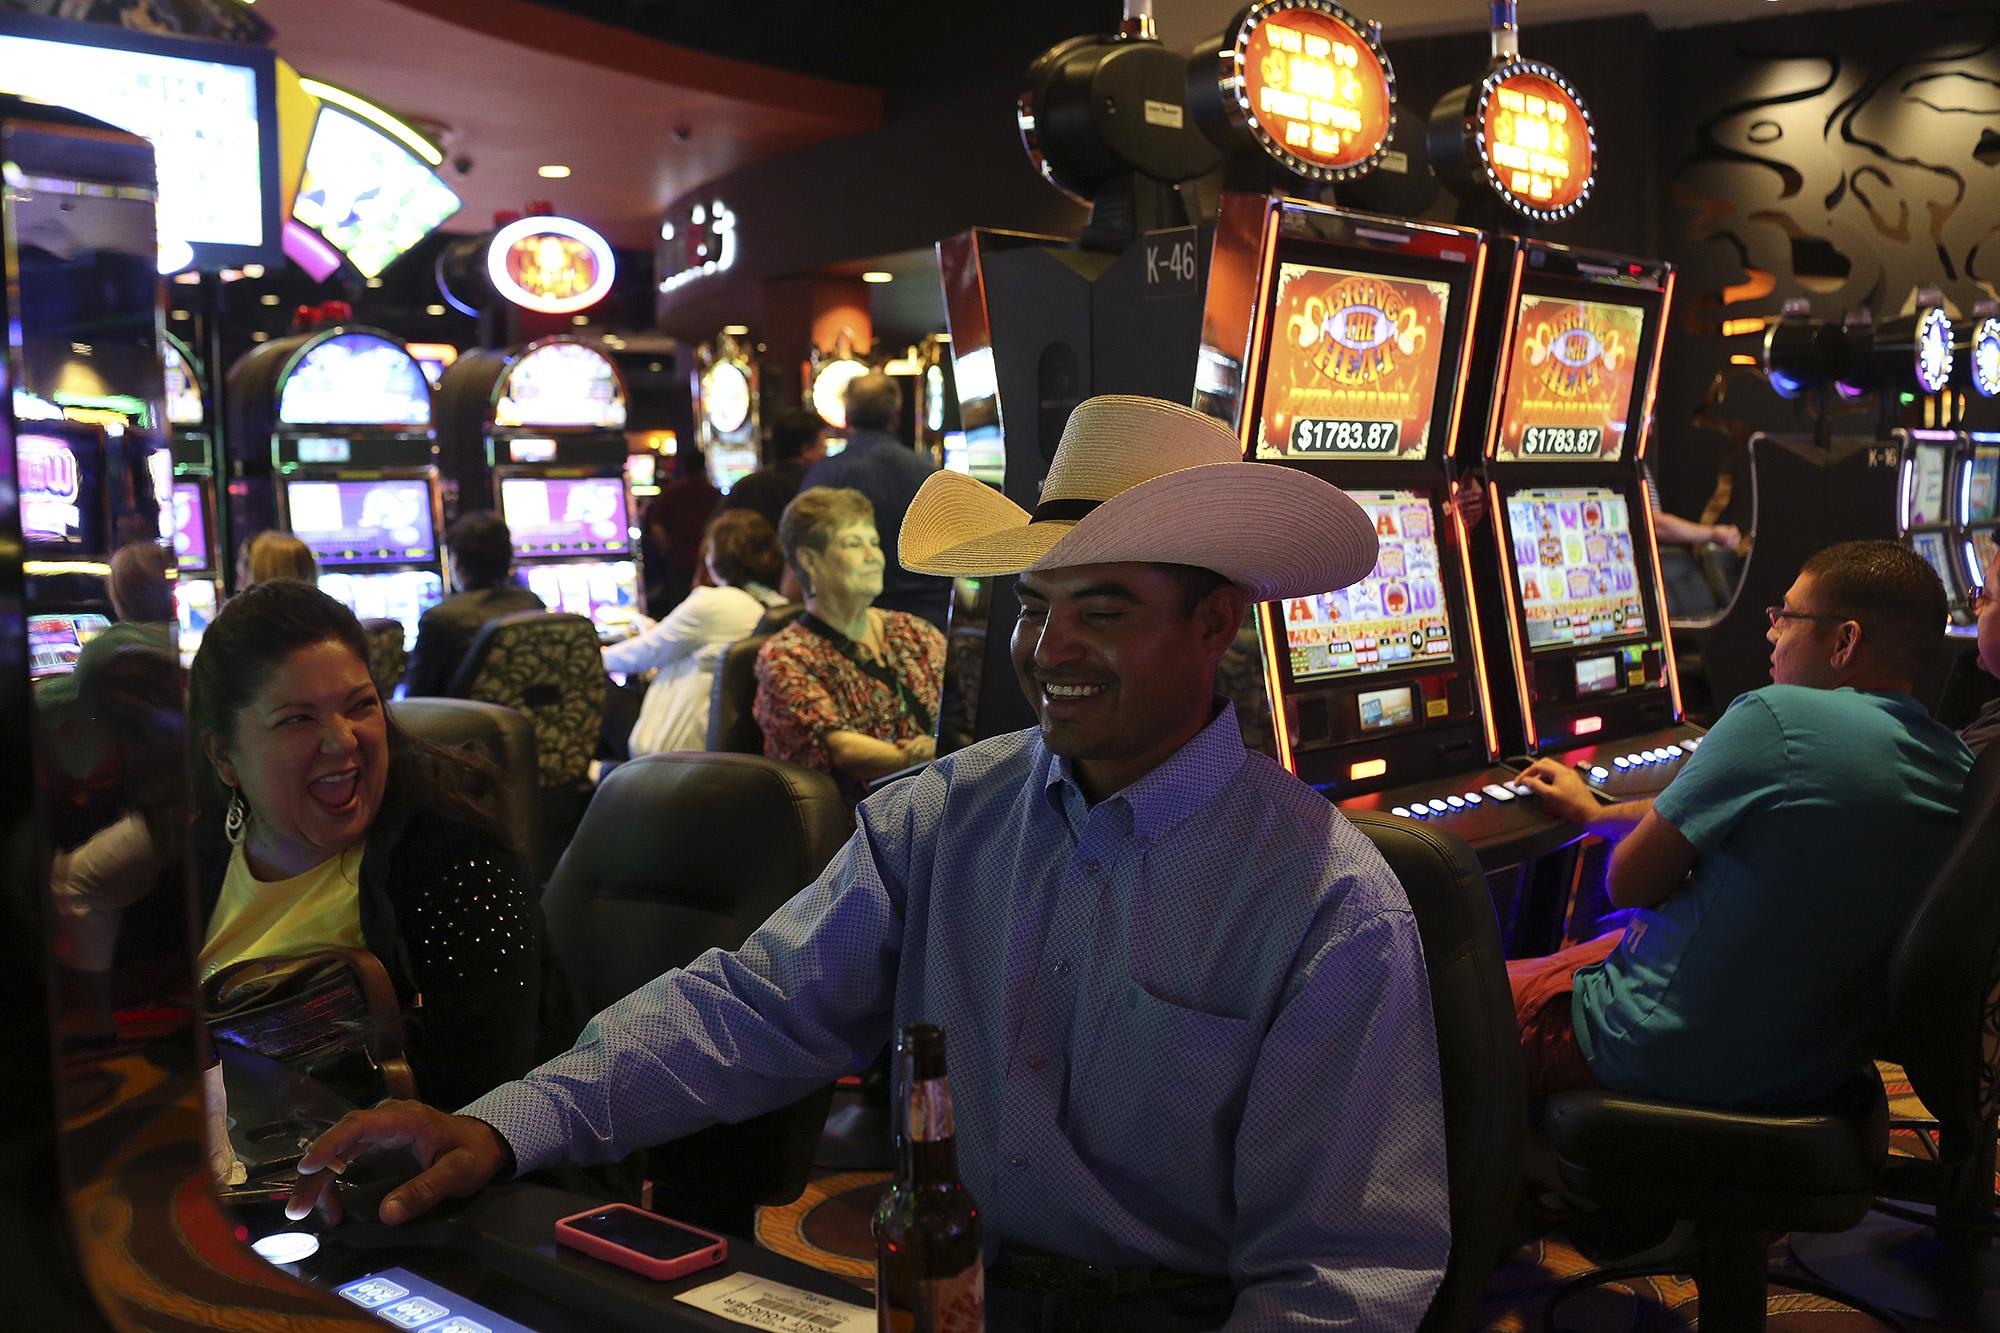 Www.antonio-casino.com addiction compulsive gambling recovery